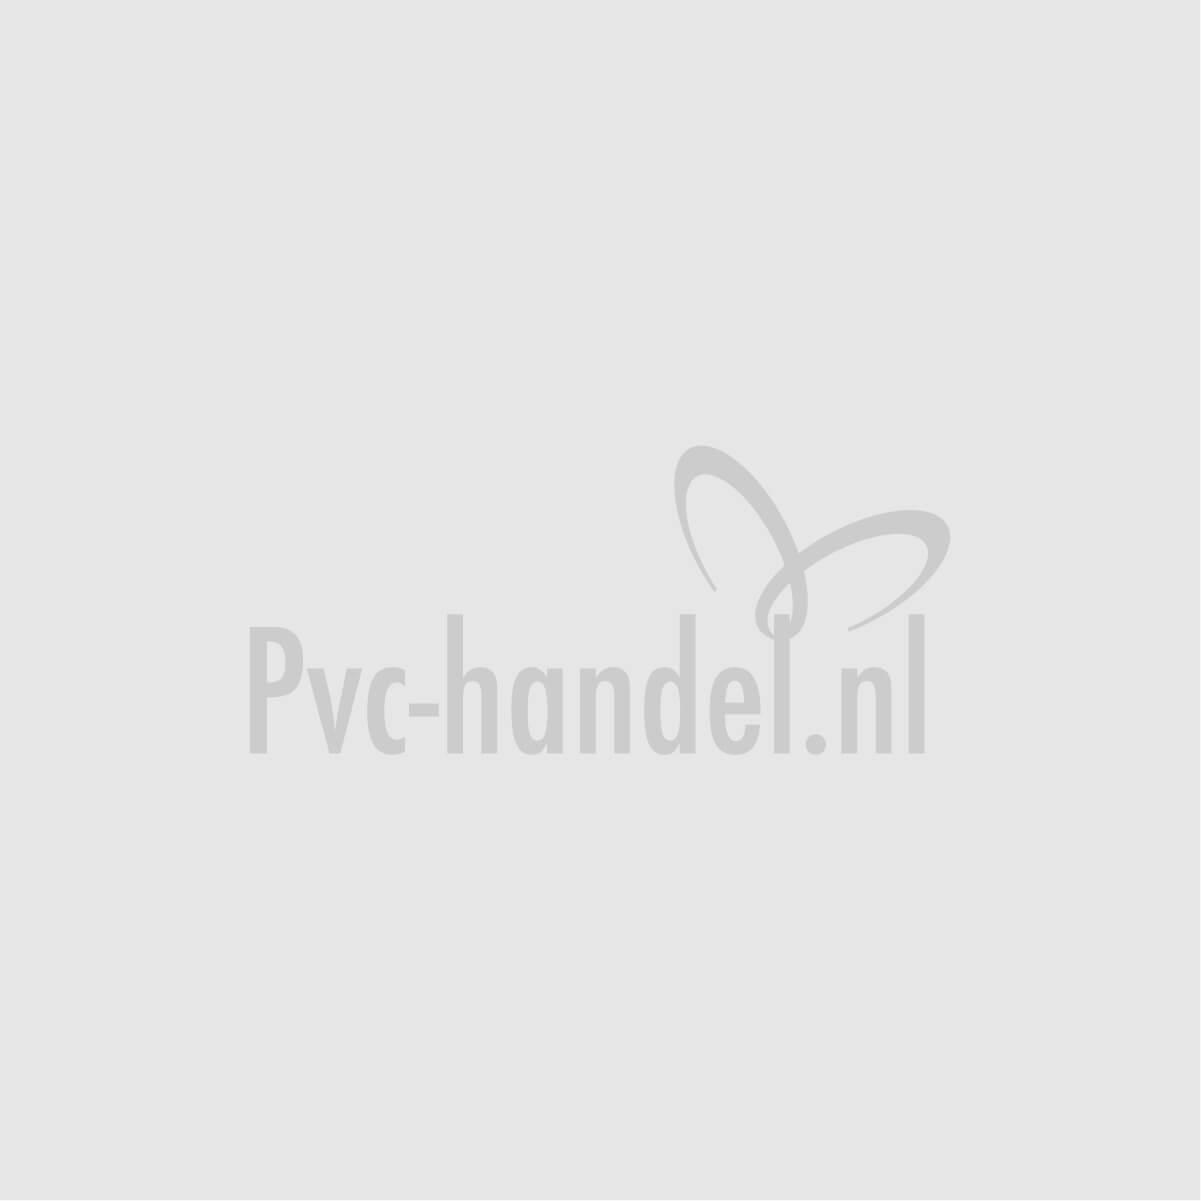 PVC drukbuis ongekeurd 10bar